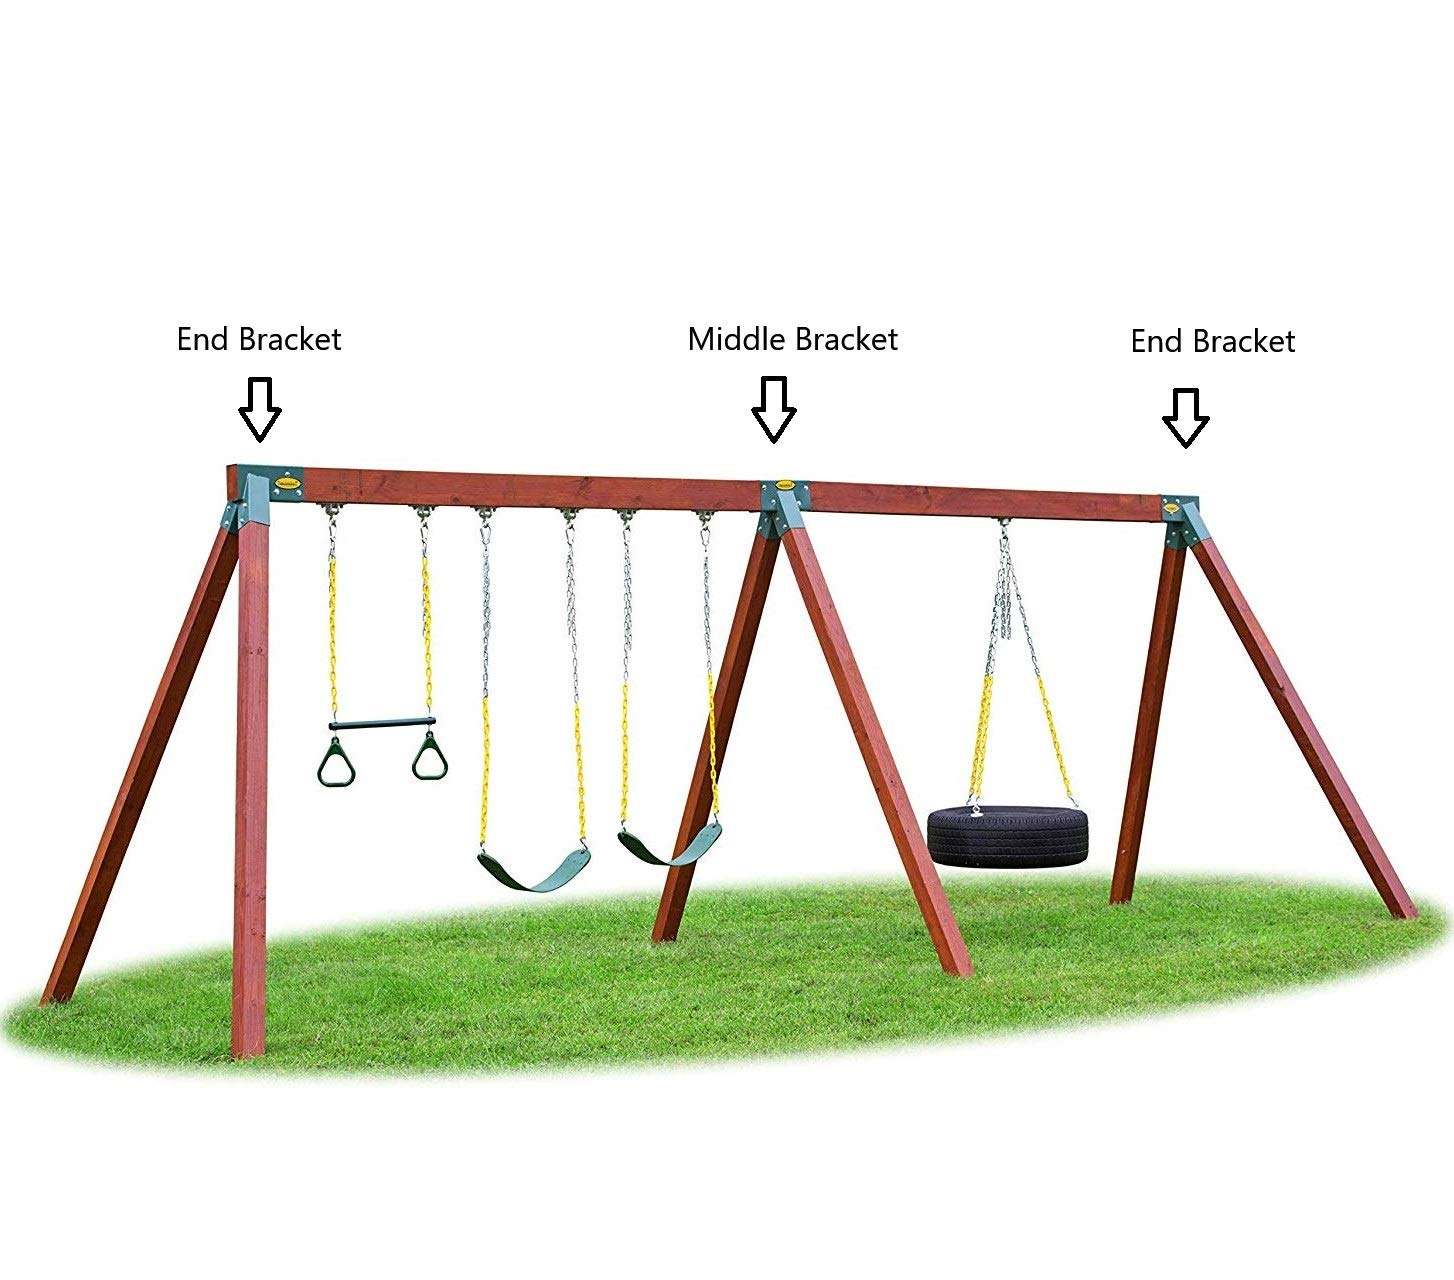 Eastern Jungle Gym Easy 1 2 3 A Frame Swing Set Bracket Heavy Duty